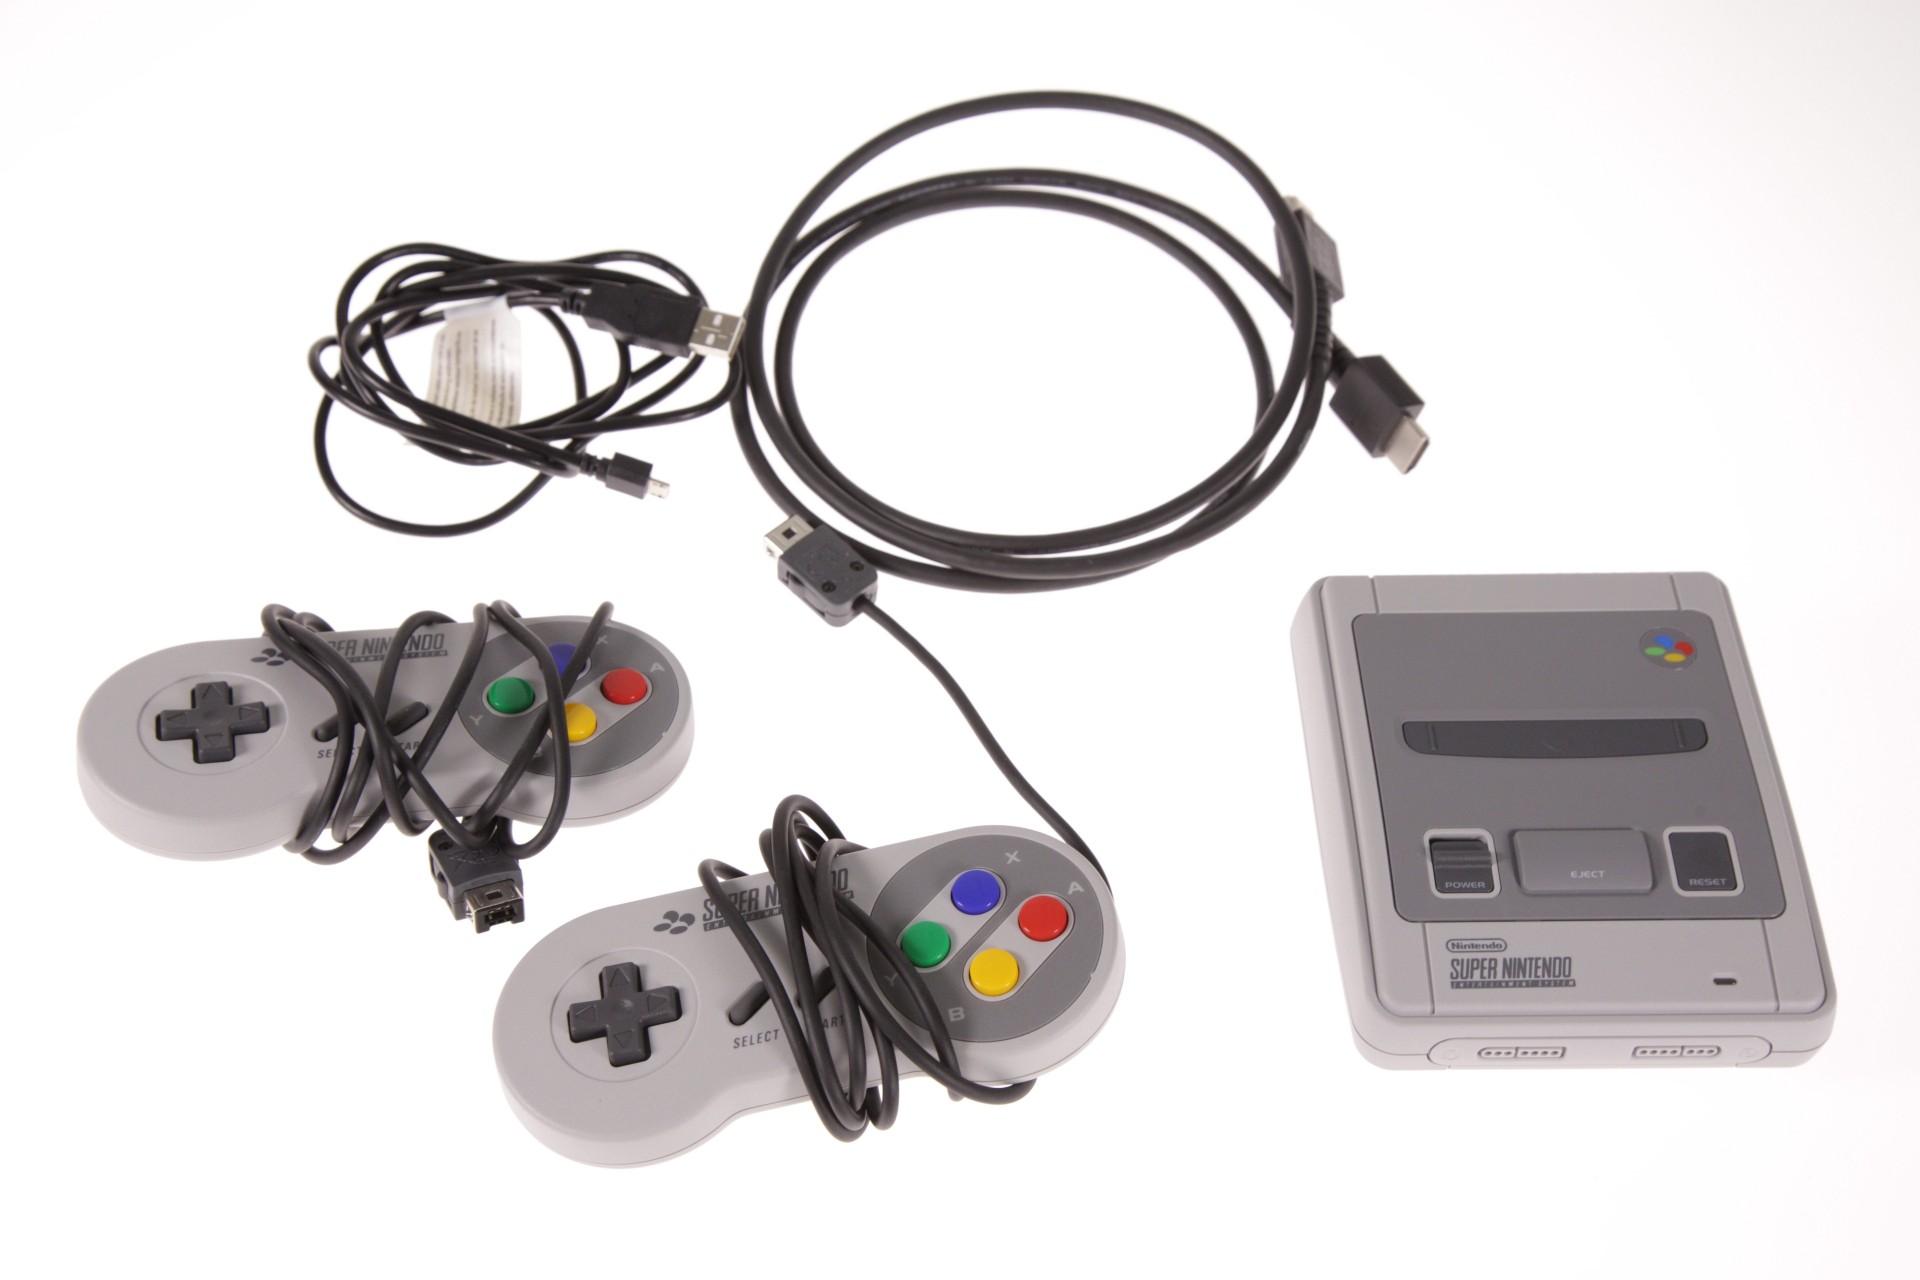 SNES Classic Mini im Vergleichstest: Putzige Retro-Konsole mit suboptimaler Emulation - SNES Classic Mini (Foto: Martin Wolf/Golem.de)